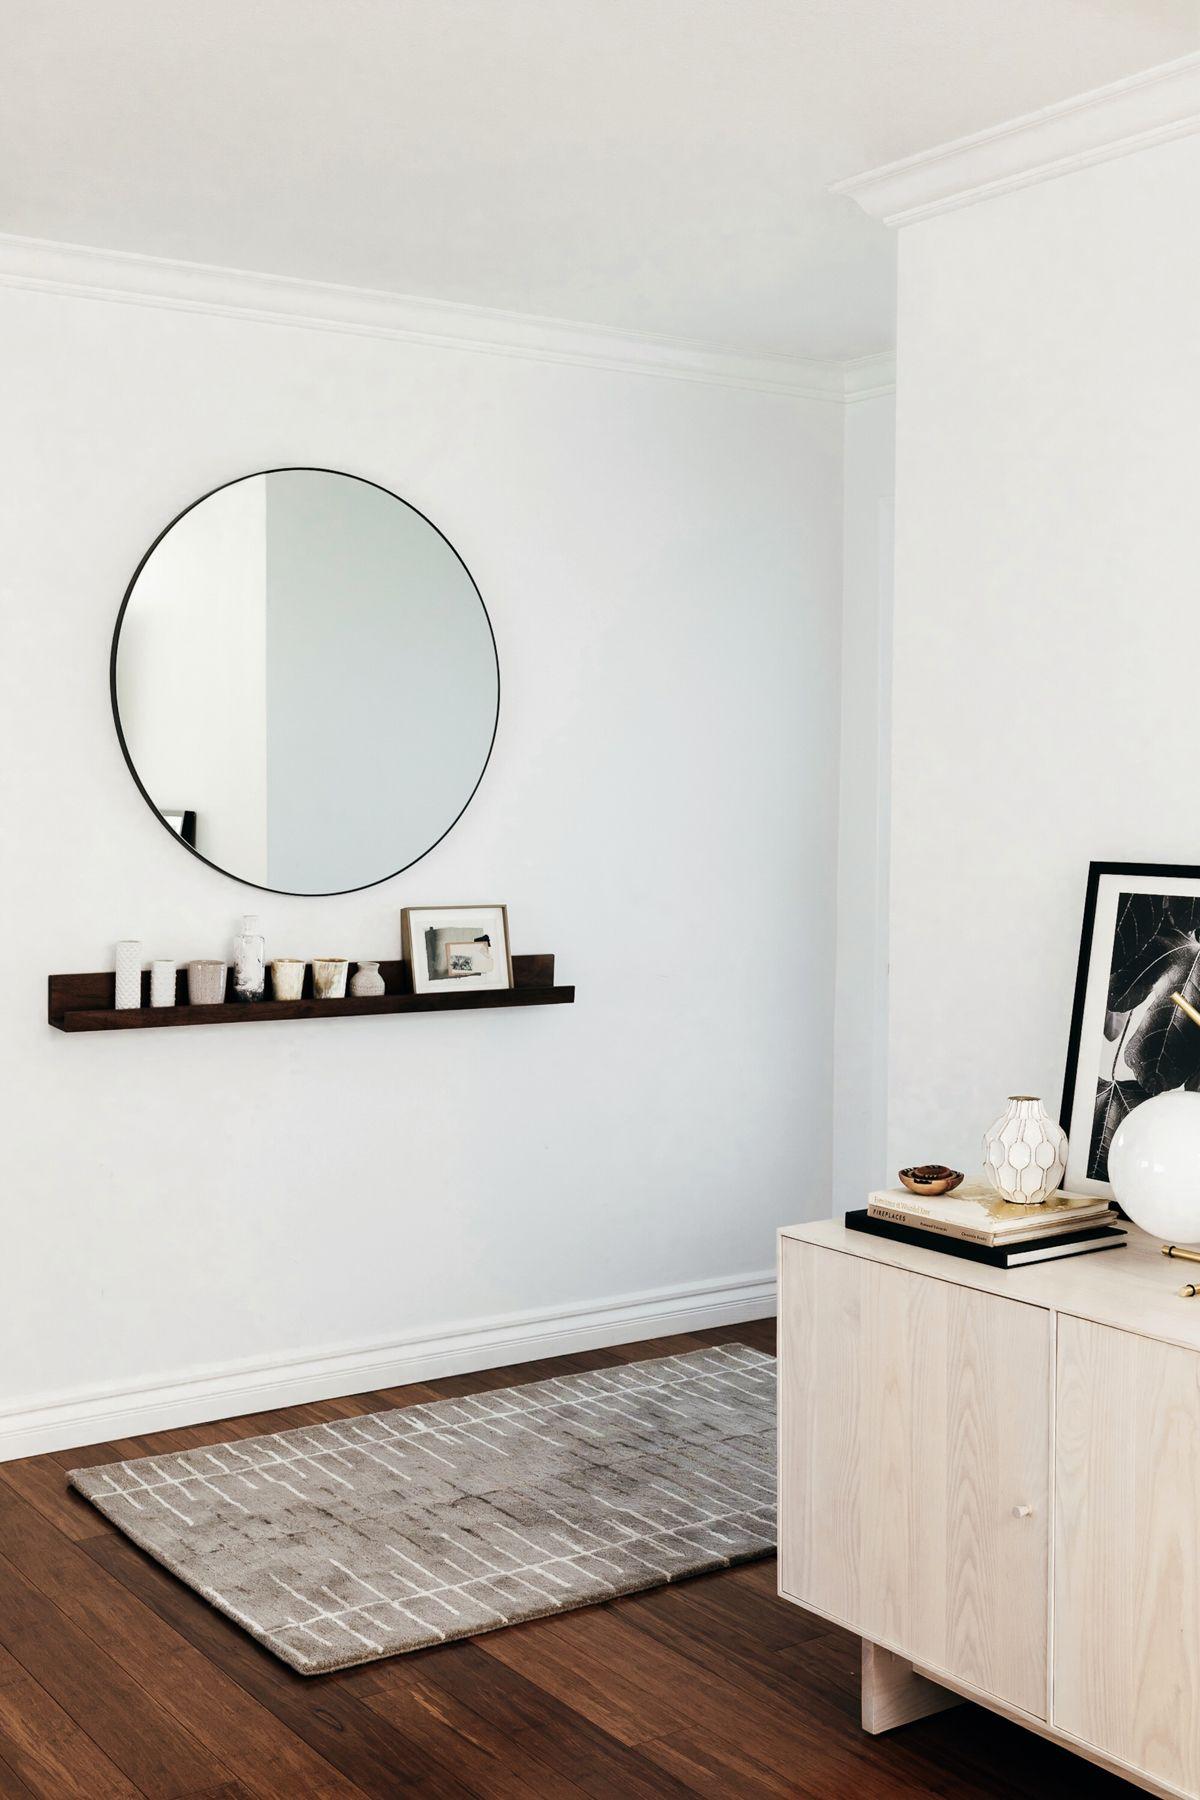 Entry Way Round Mirror Ledge Shelf Neutral Decor Black And White Eatsleepwear Living Remodel Bedroom Small Bedroom Remodel Guest Bedroom Remodel